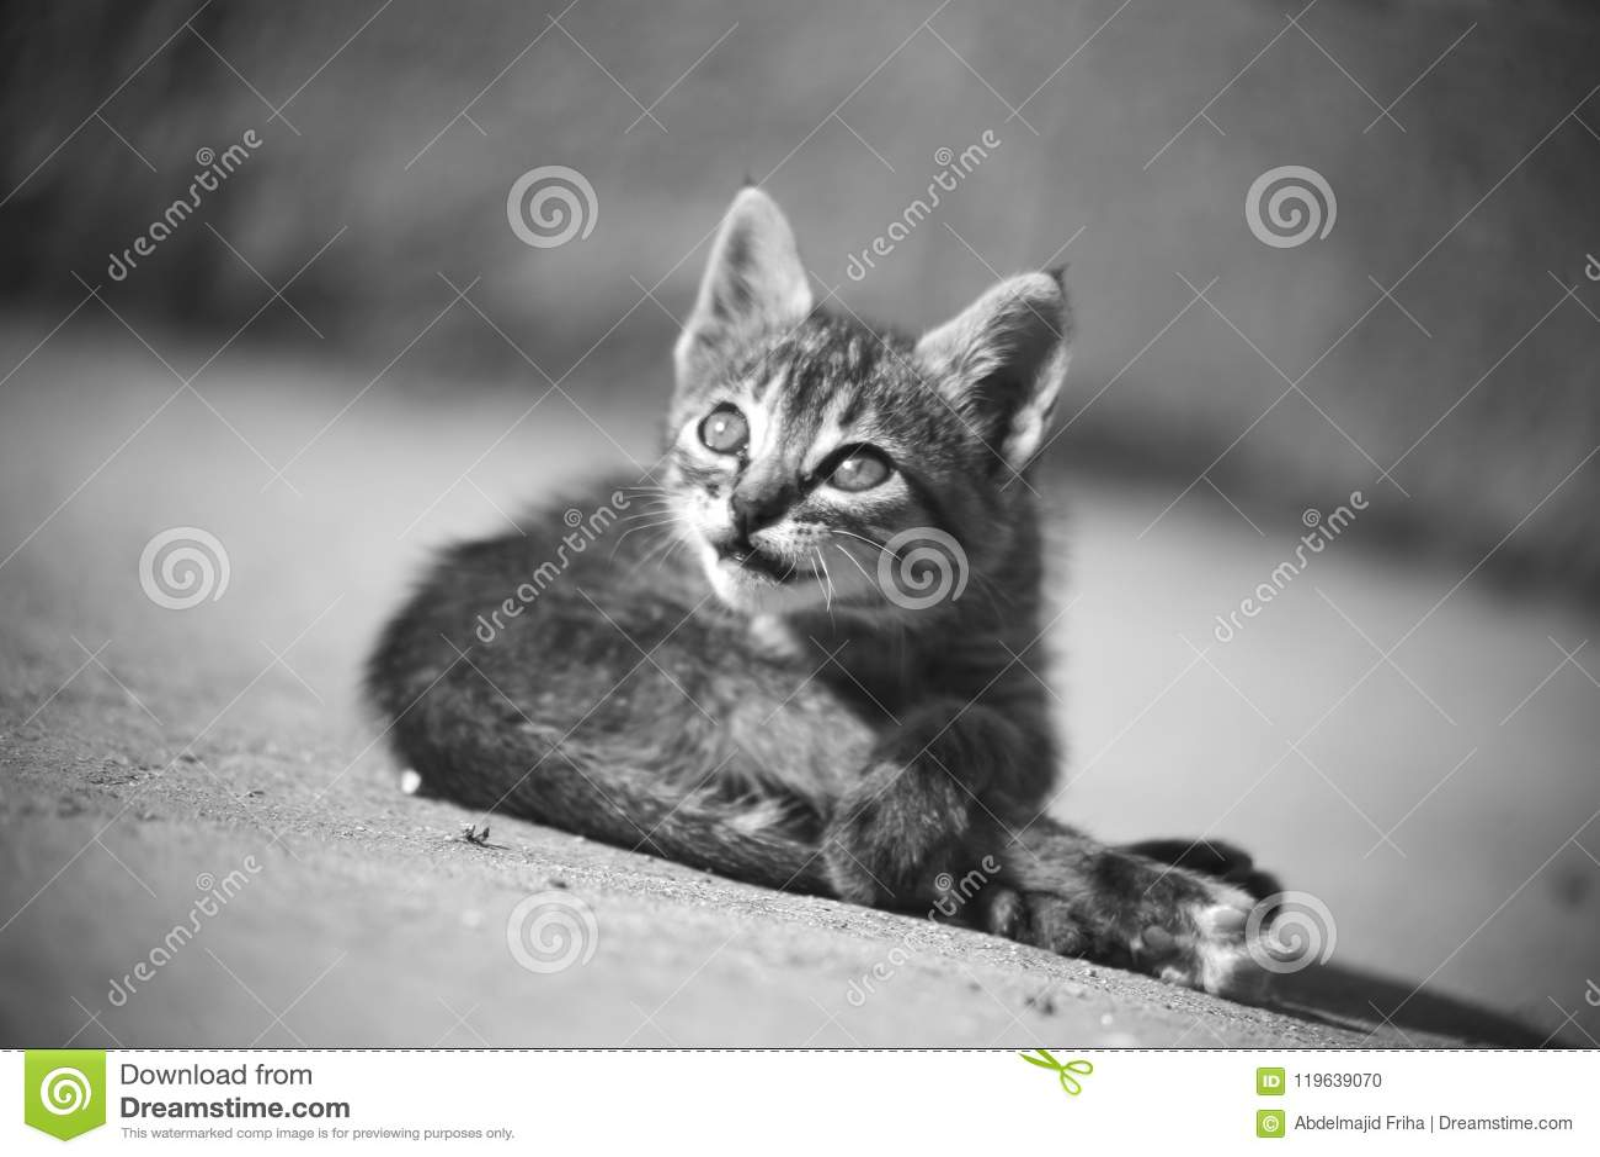 Baby cat play